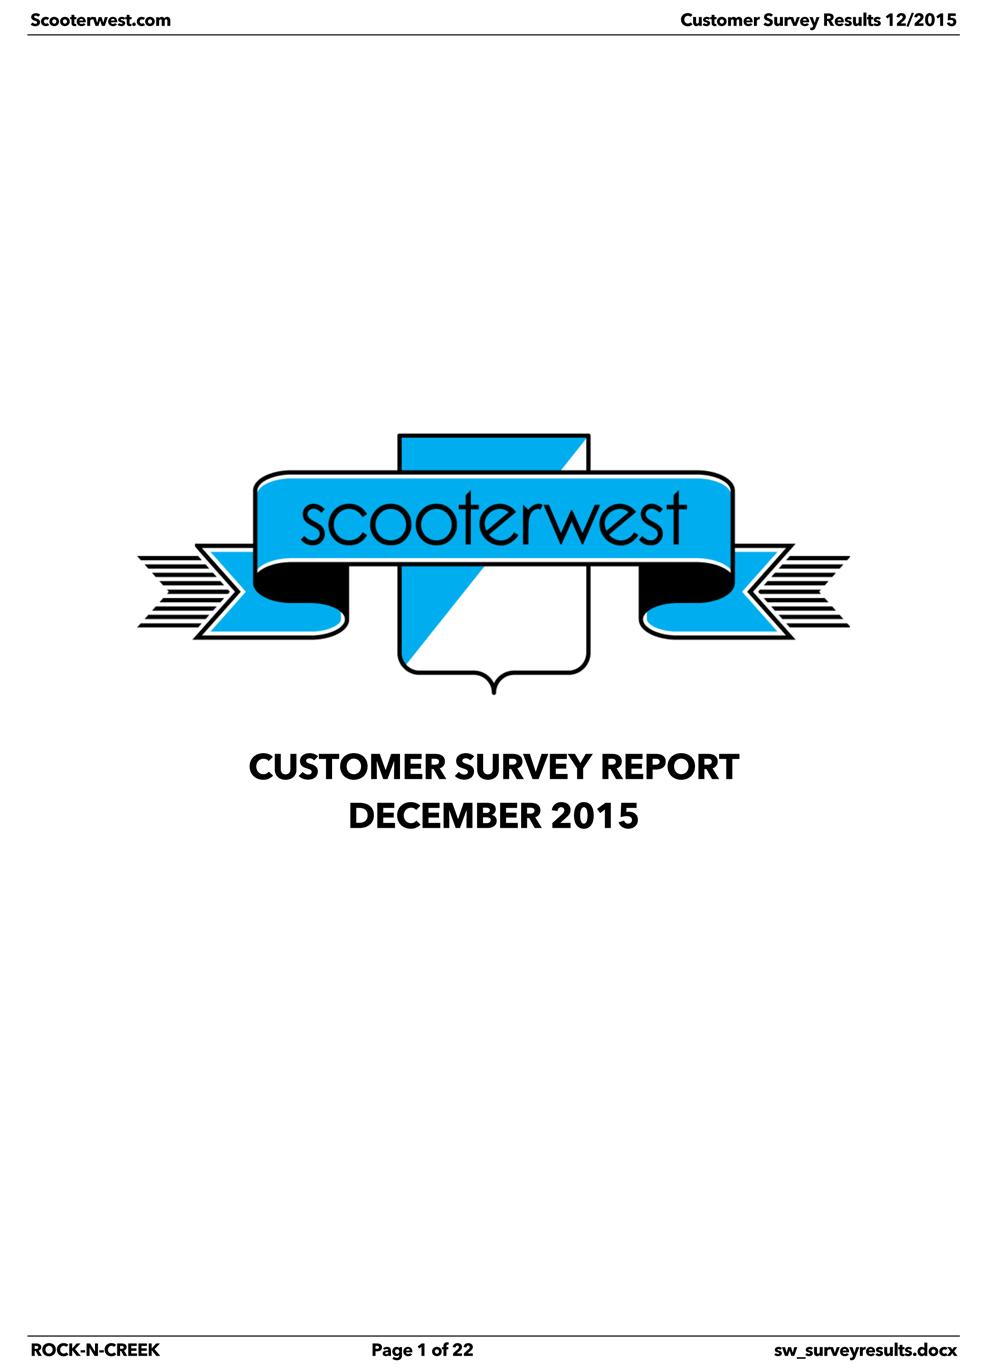 sw_surveyresults-1.jpg